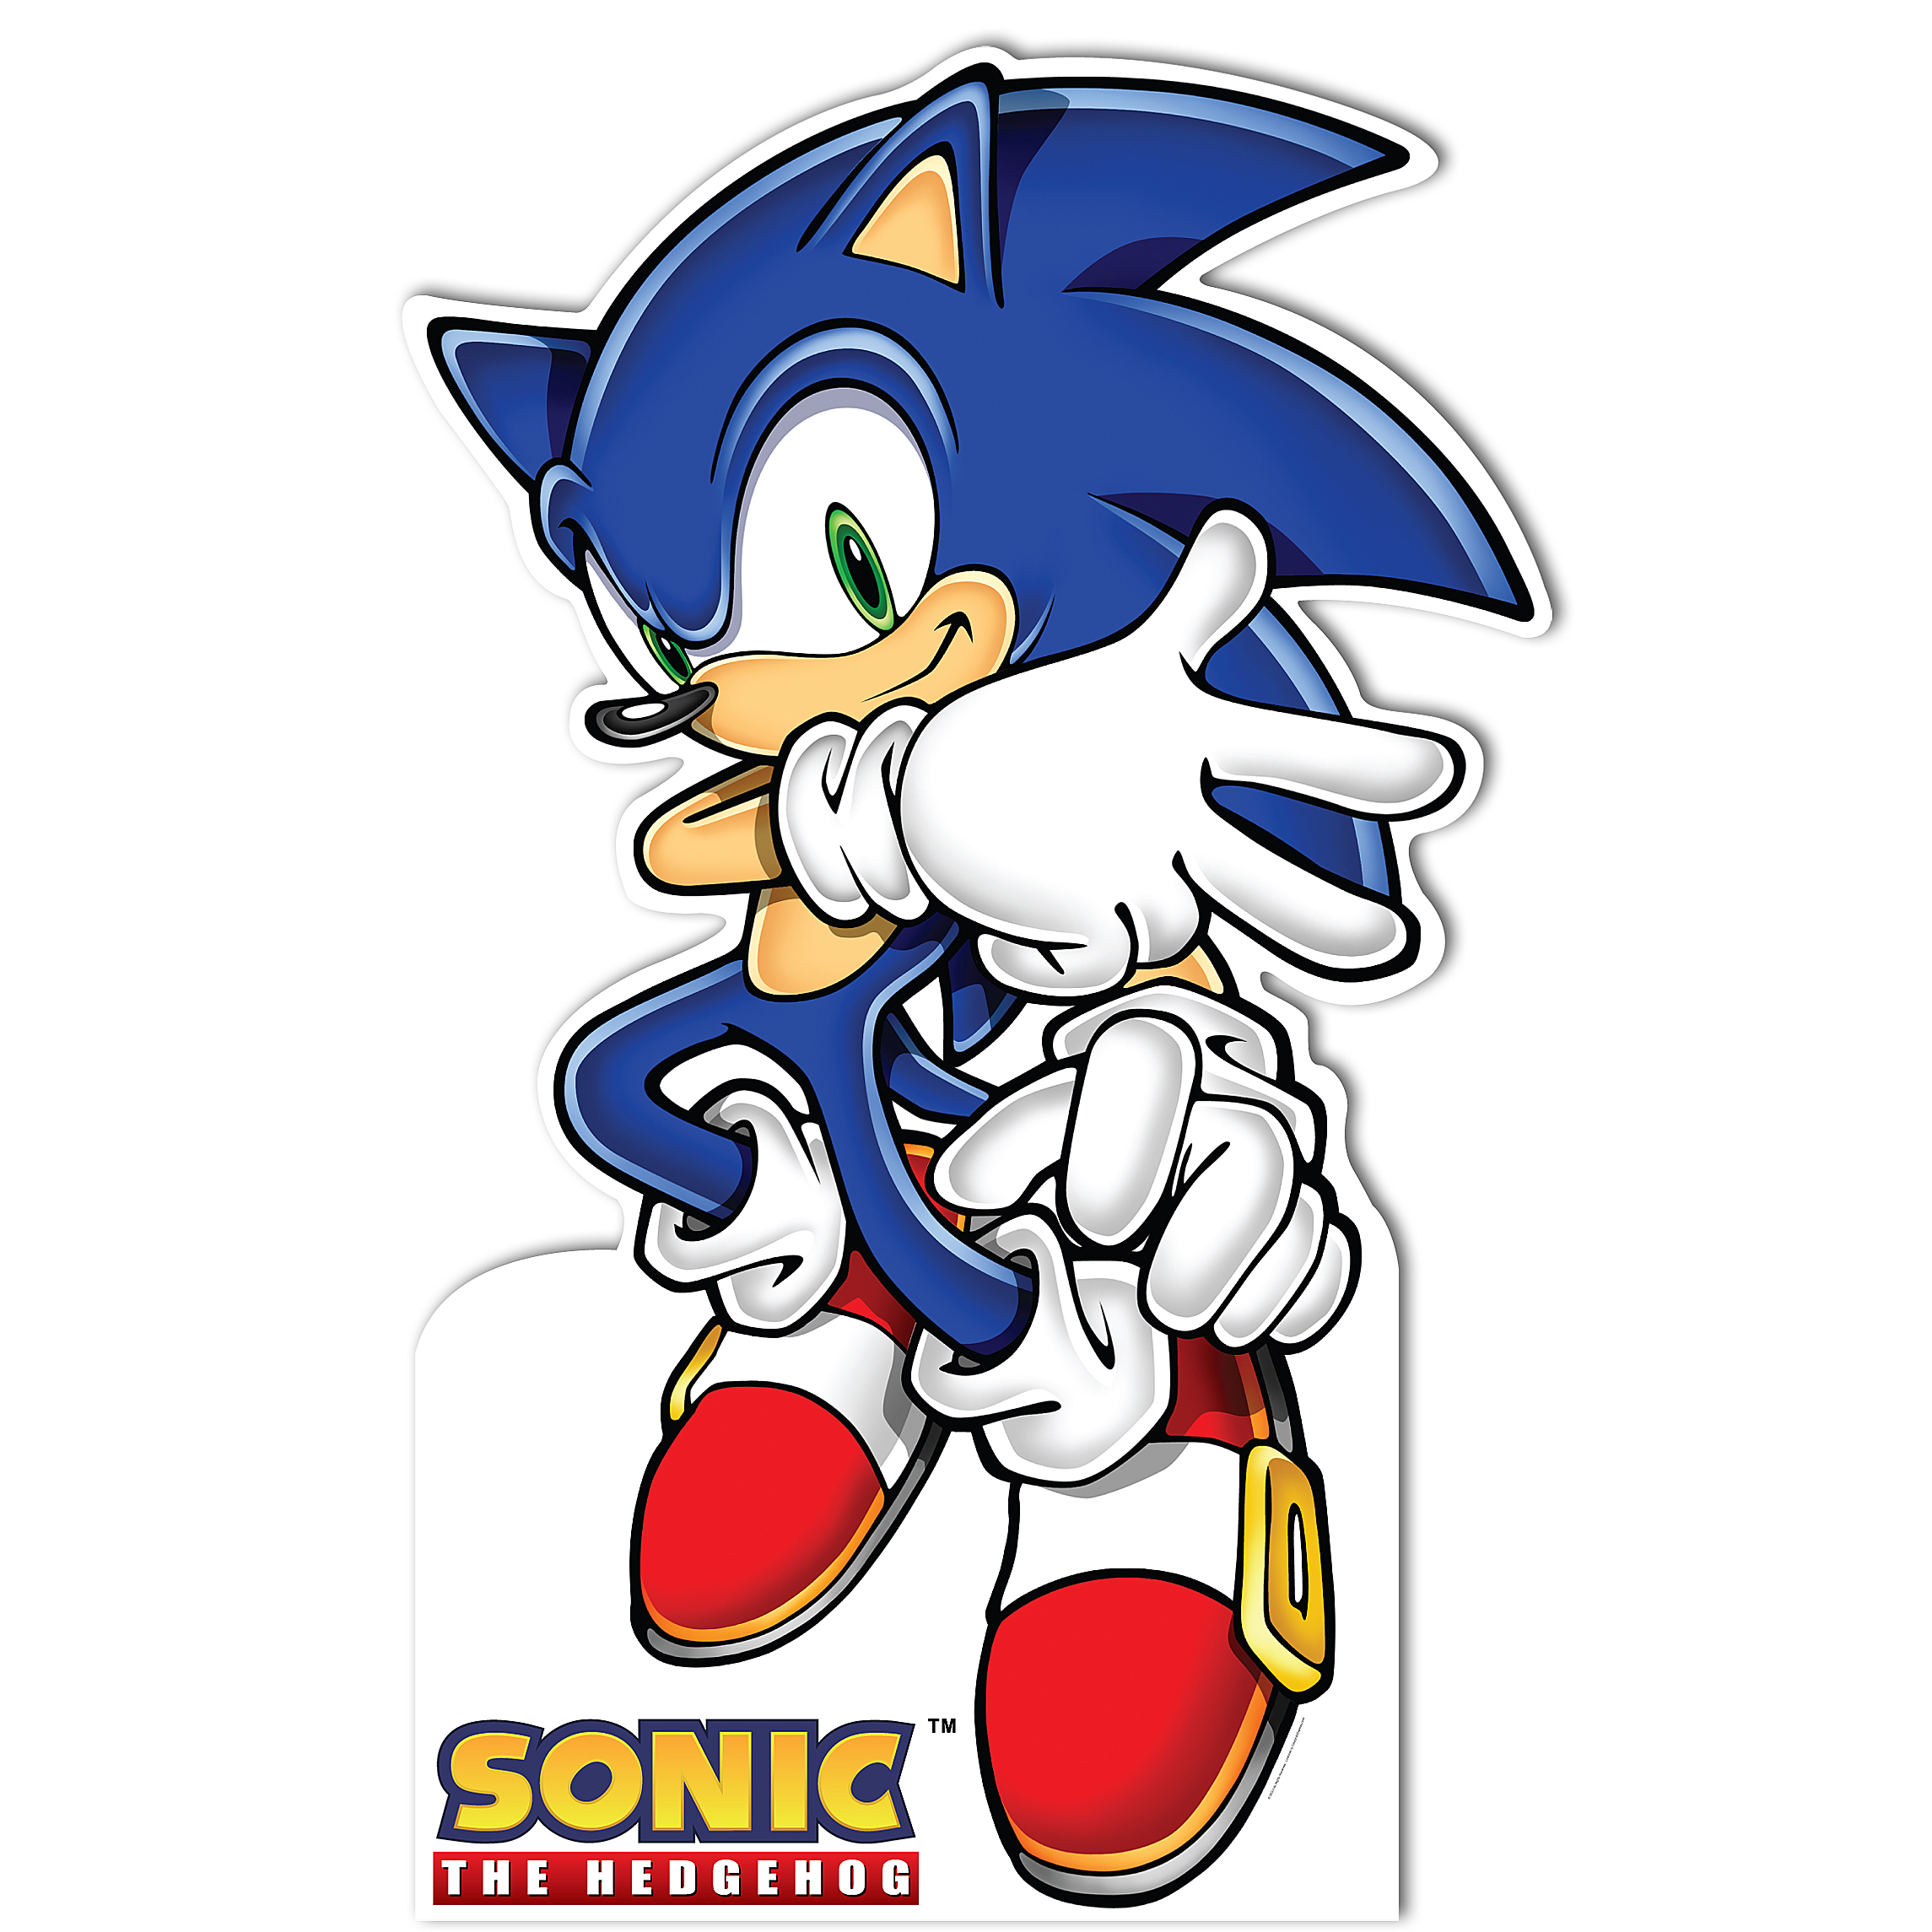 Sonic the Hedgehog Standup, 5\' Tall - Walmart.com